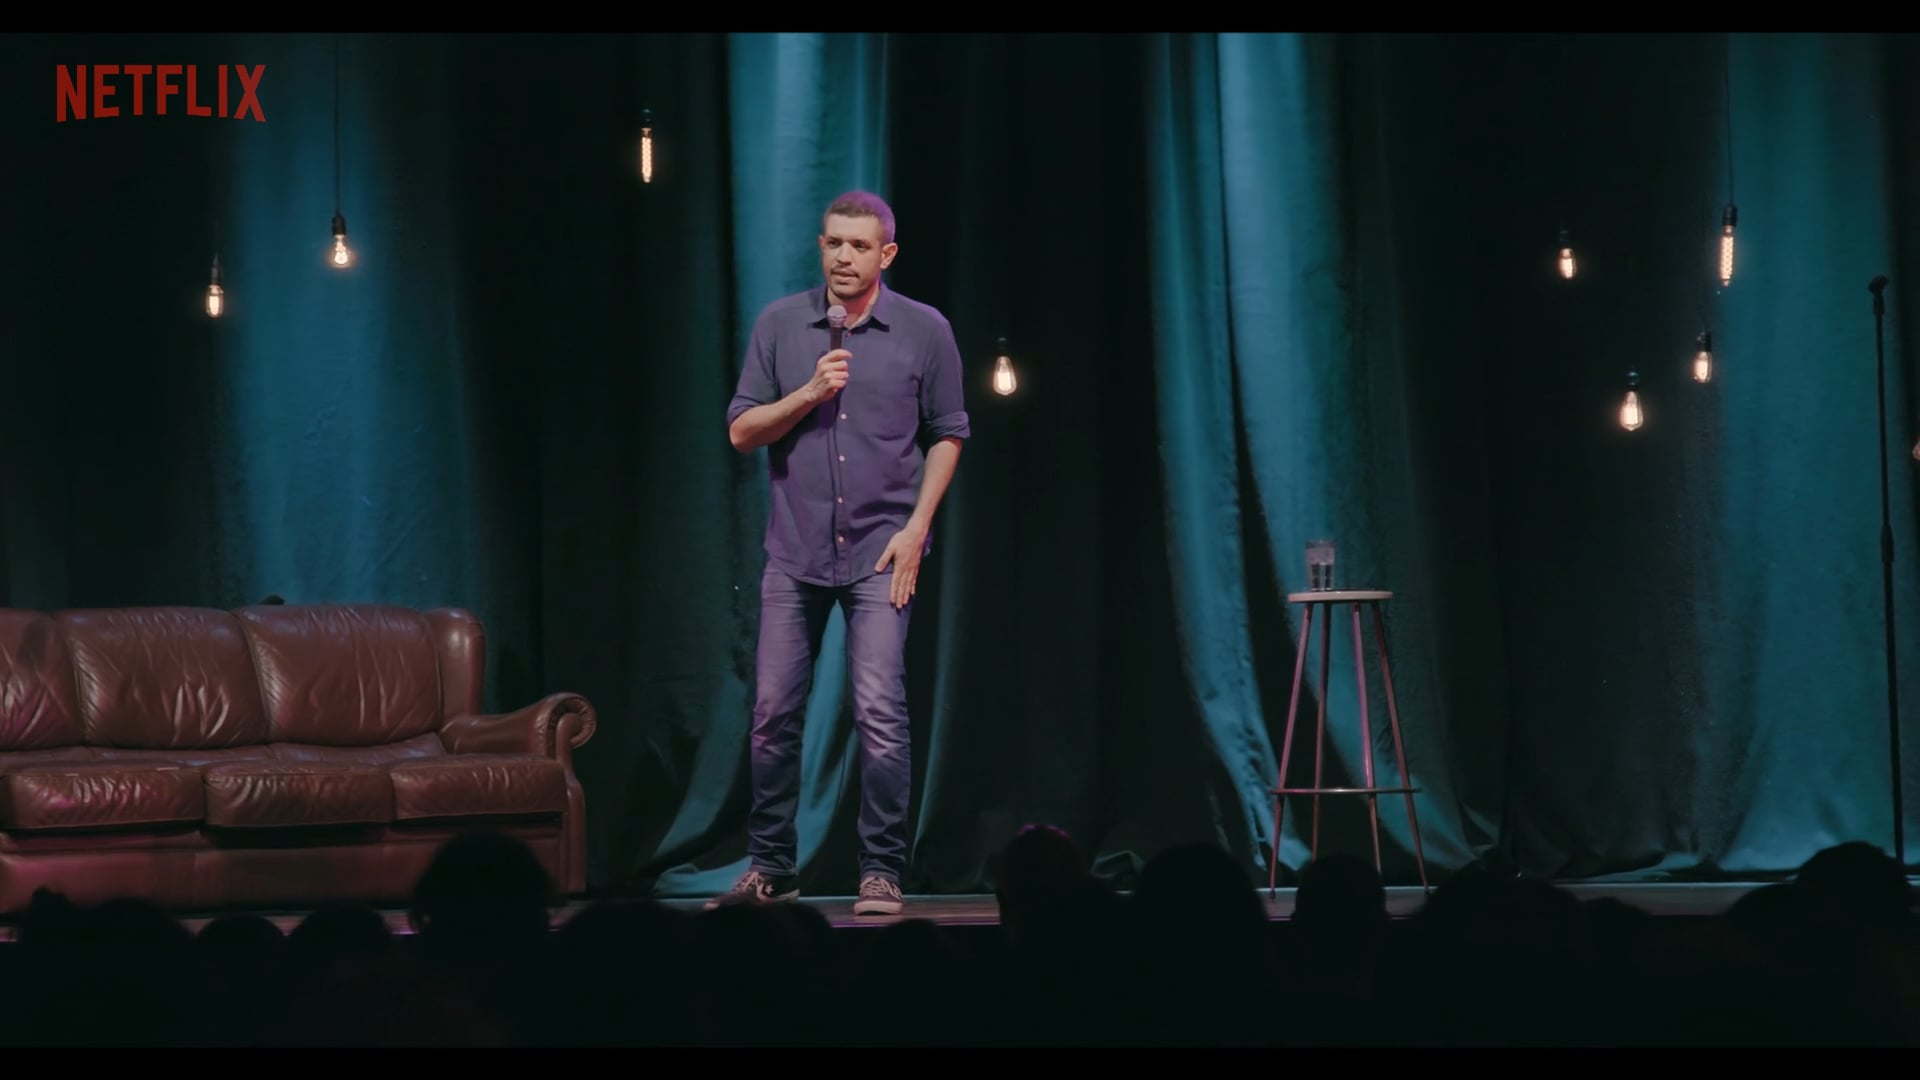 NETFLIX Francesco De Carlo standup comedy